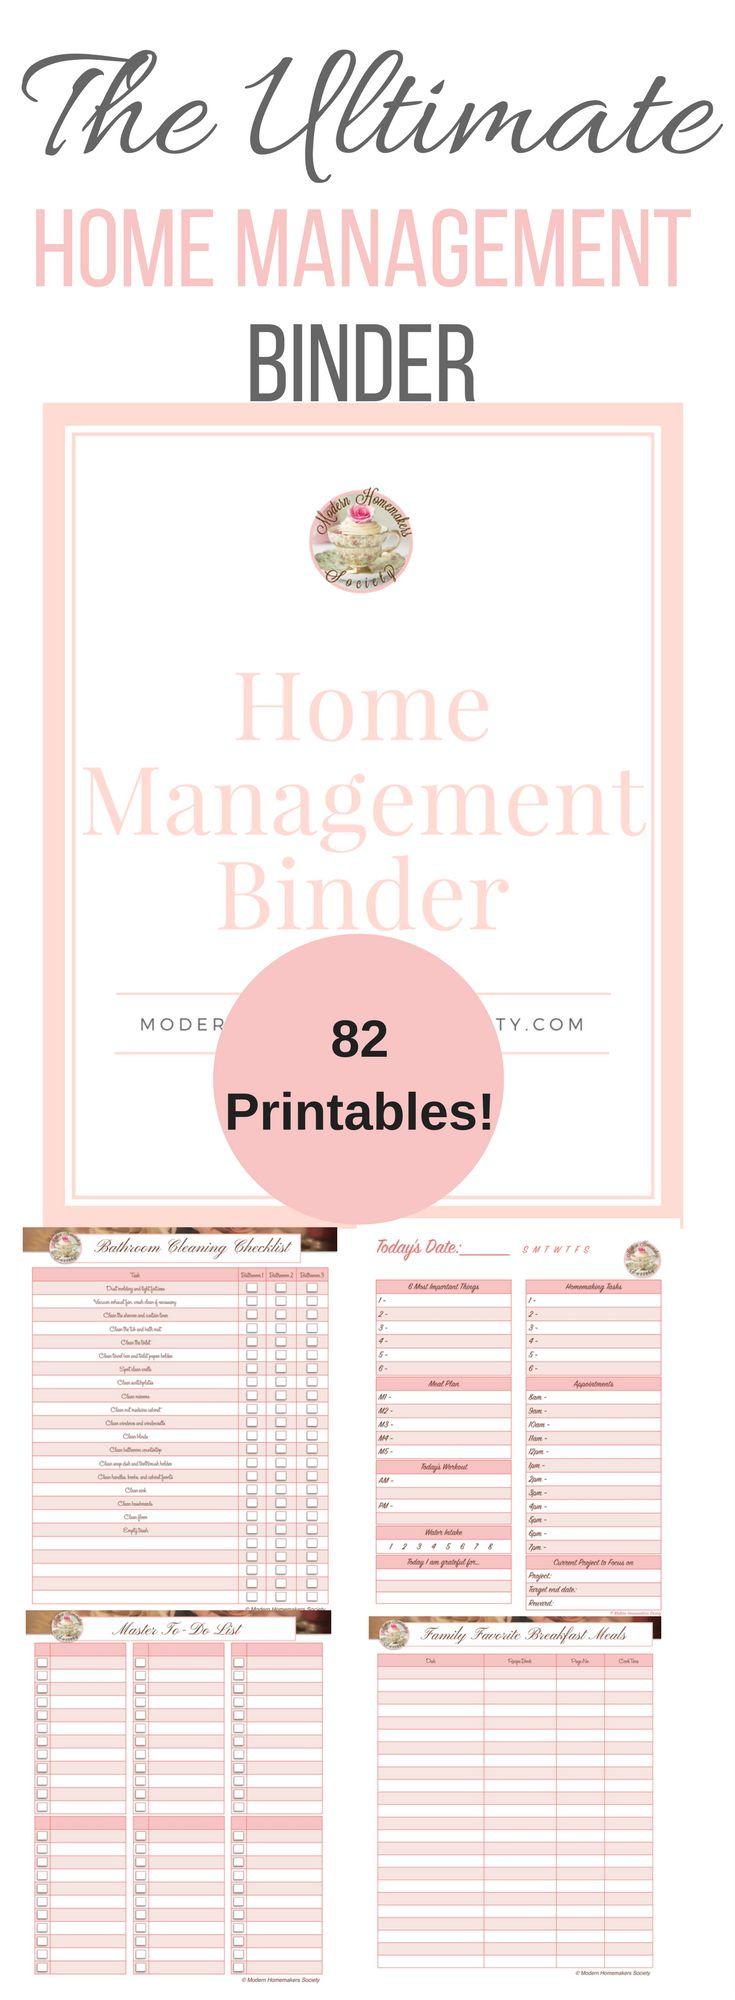 The Ultimate Home Management Binder